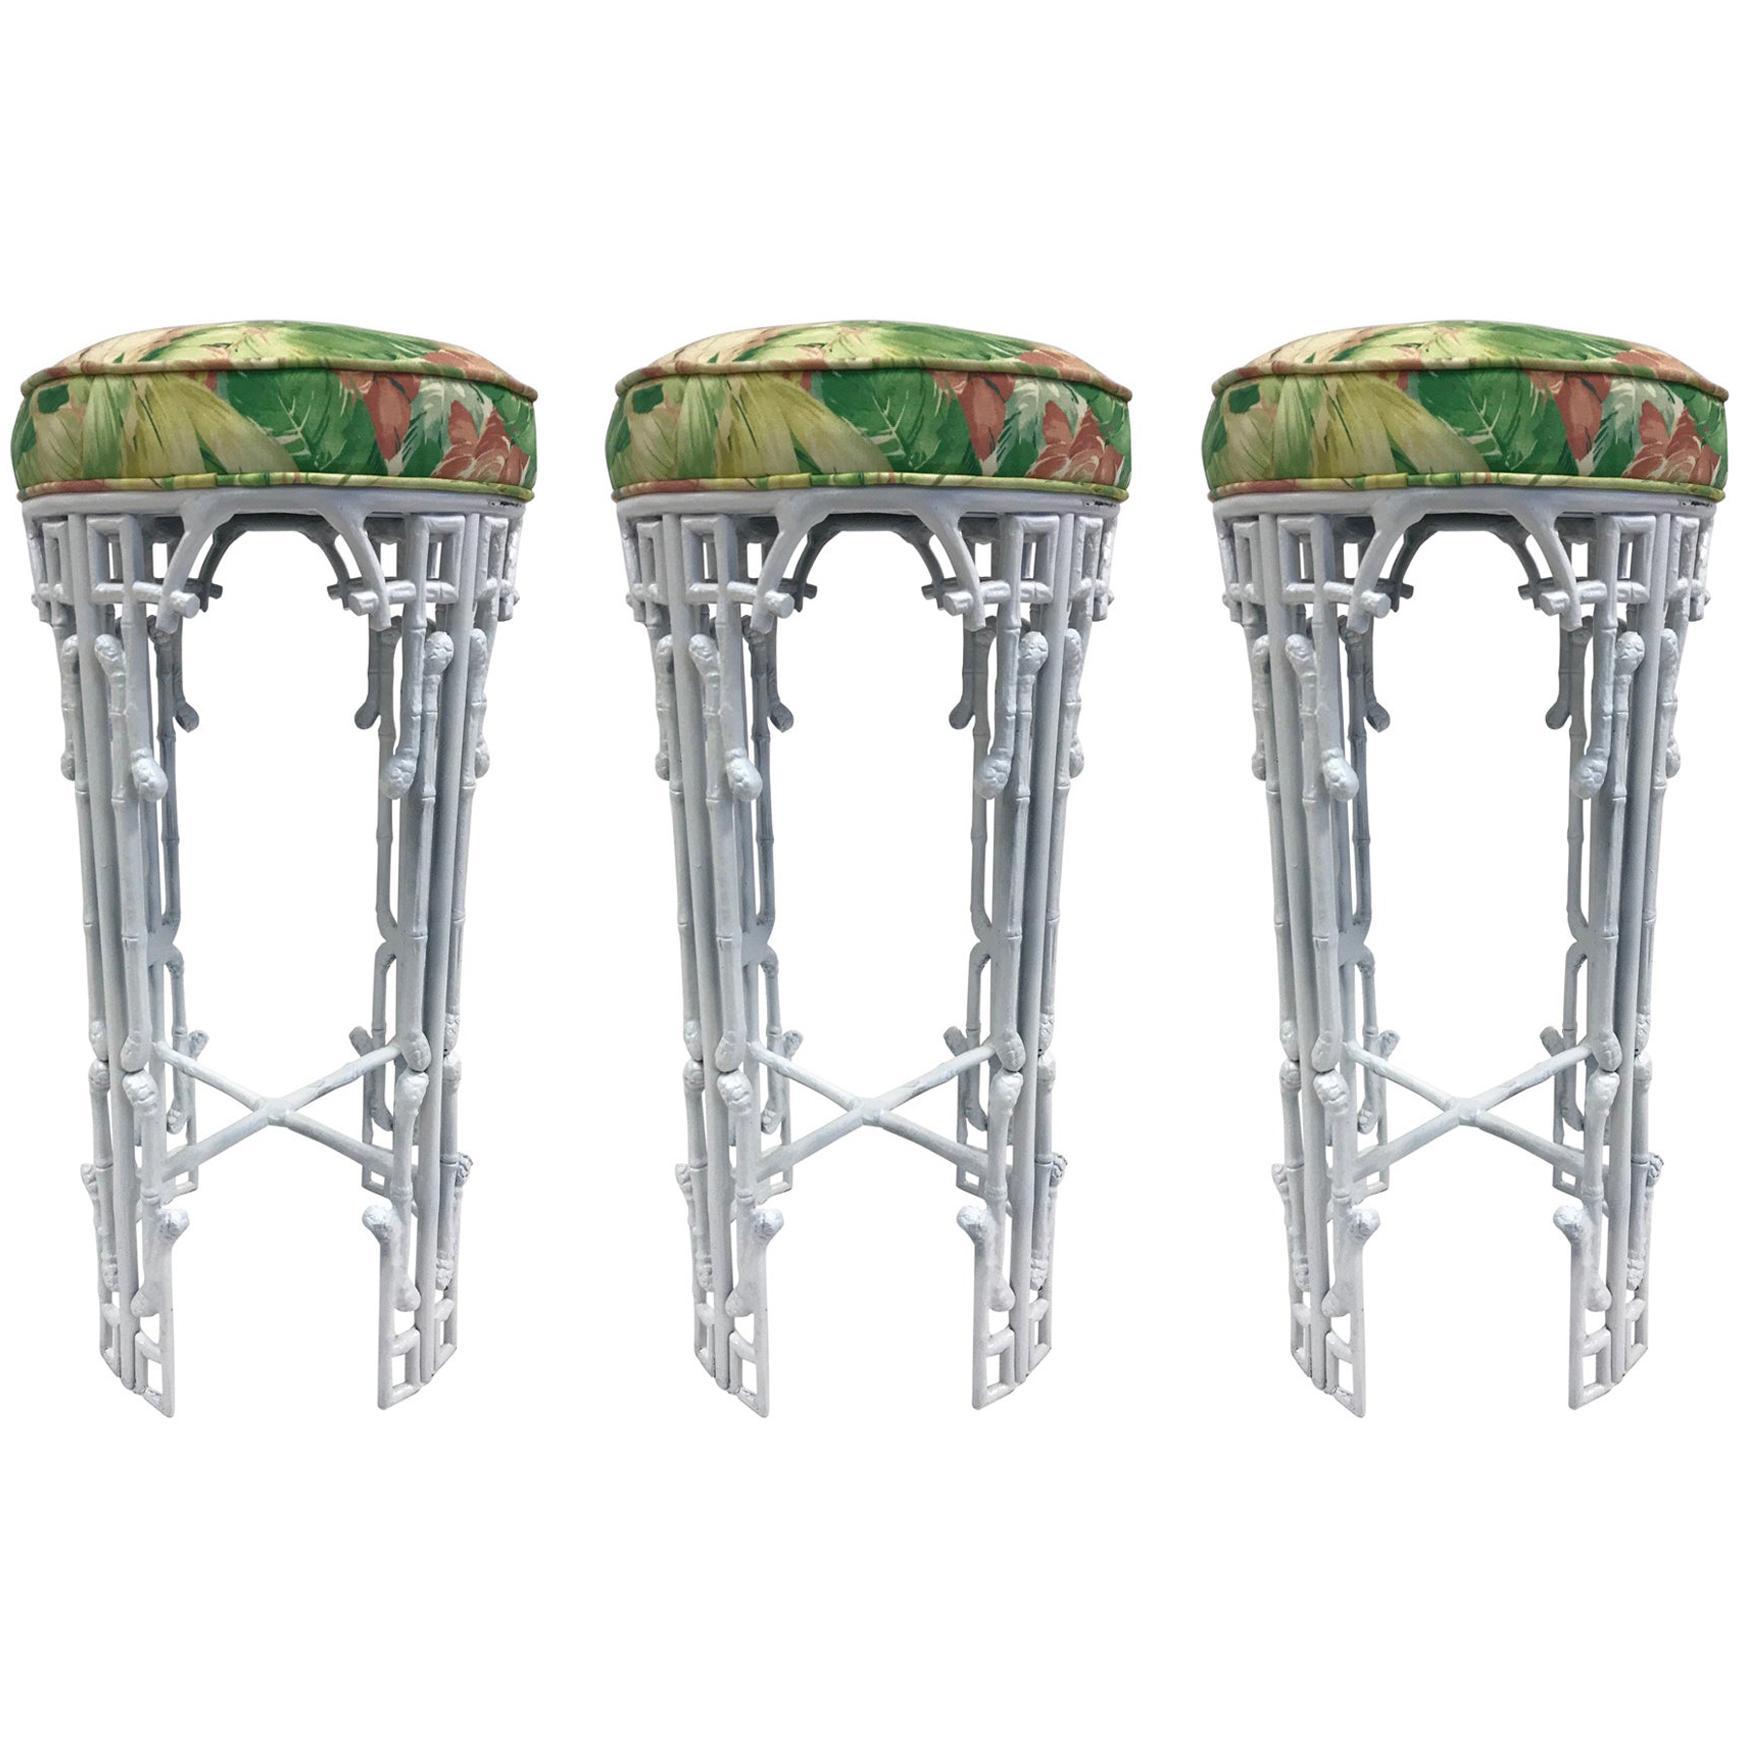 Three Hollywood Regency Faux Bamboo Bar Stools